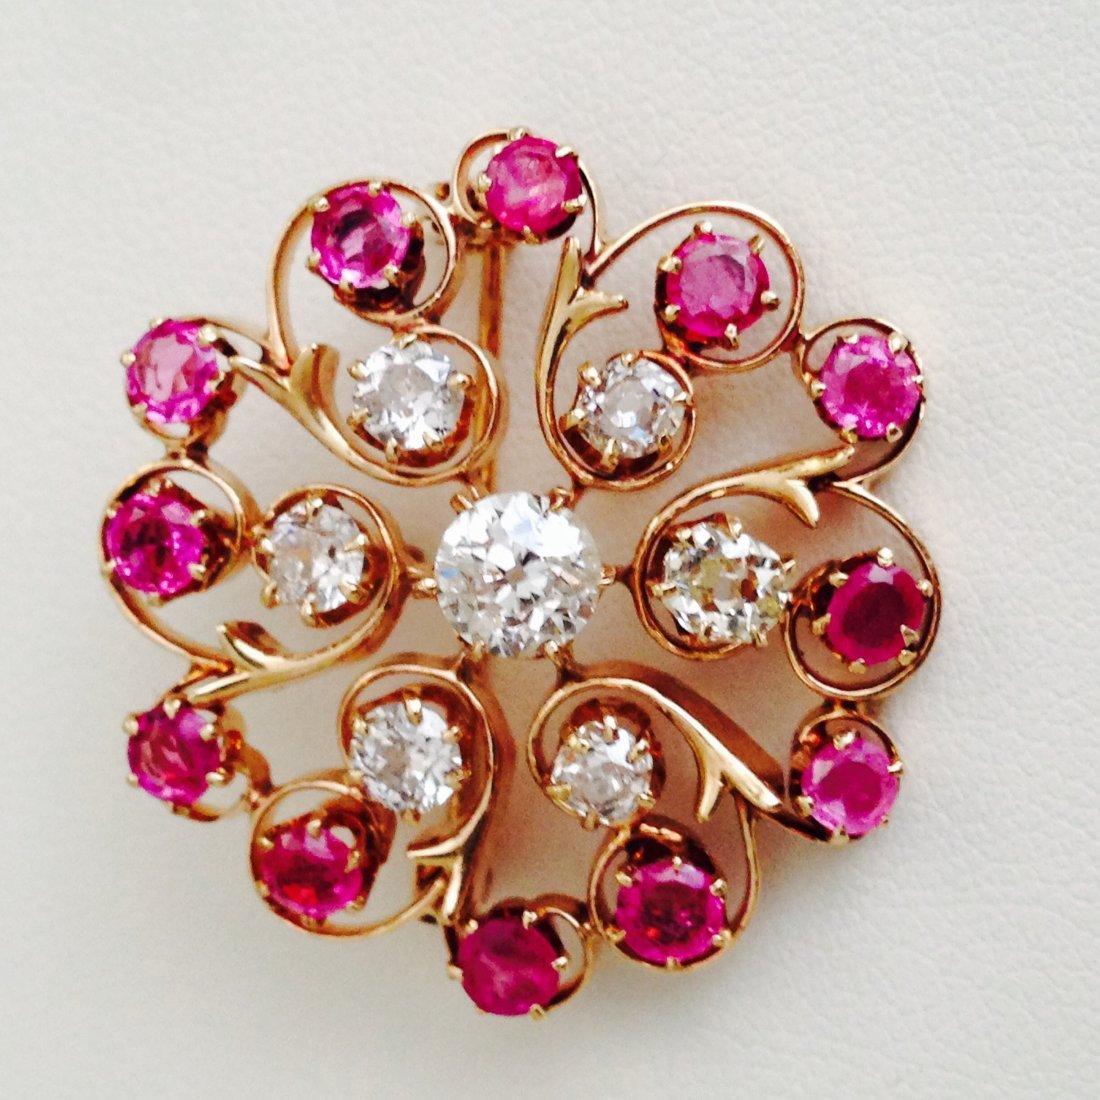 VINTAGE 3.7 CARAT DIAMOND AND RUBY PIN/PENDANT